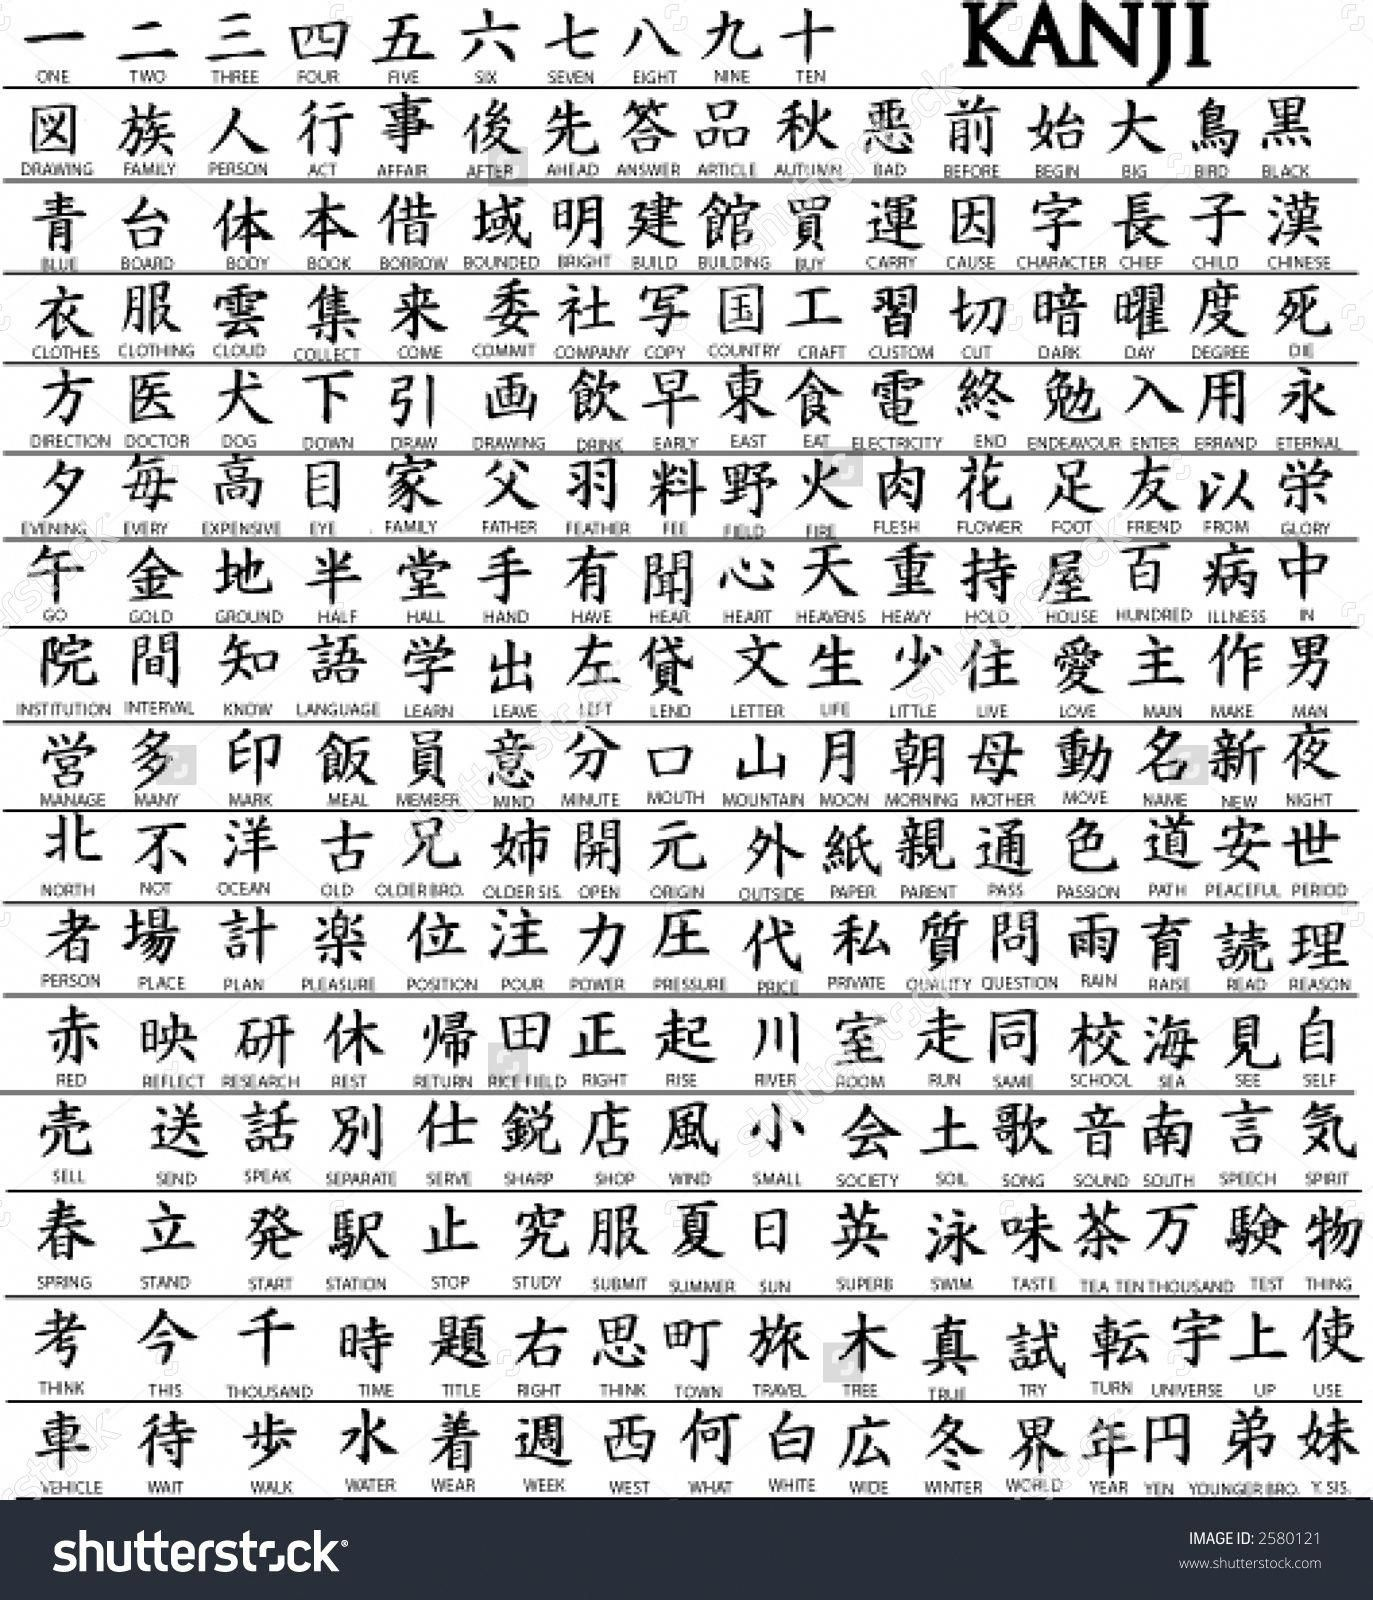 List of 100 kanji with translation | Learn Japanese & how ...